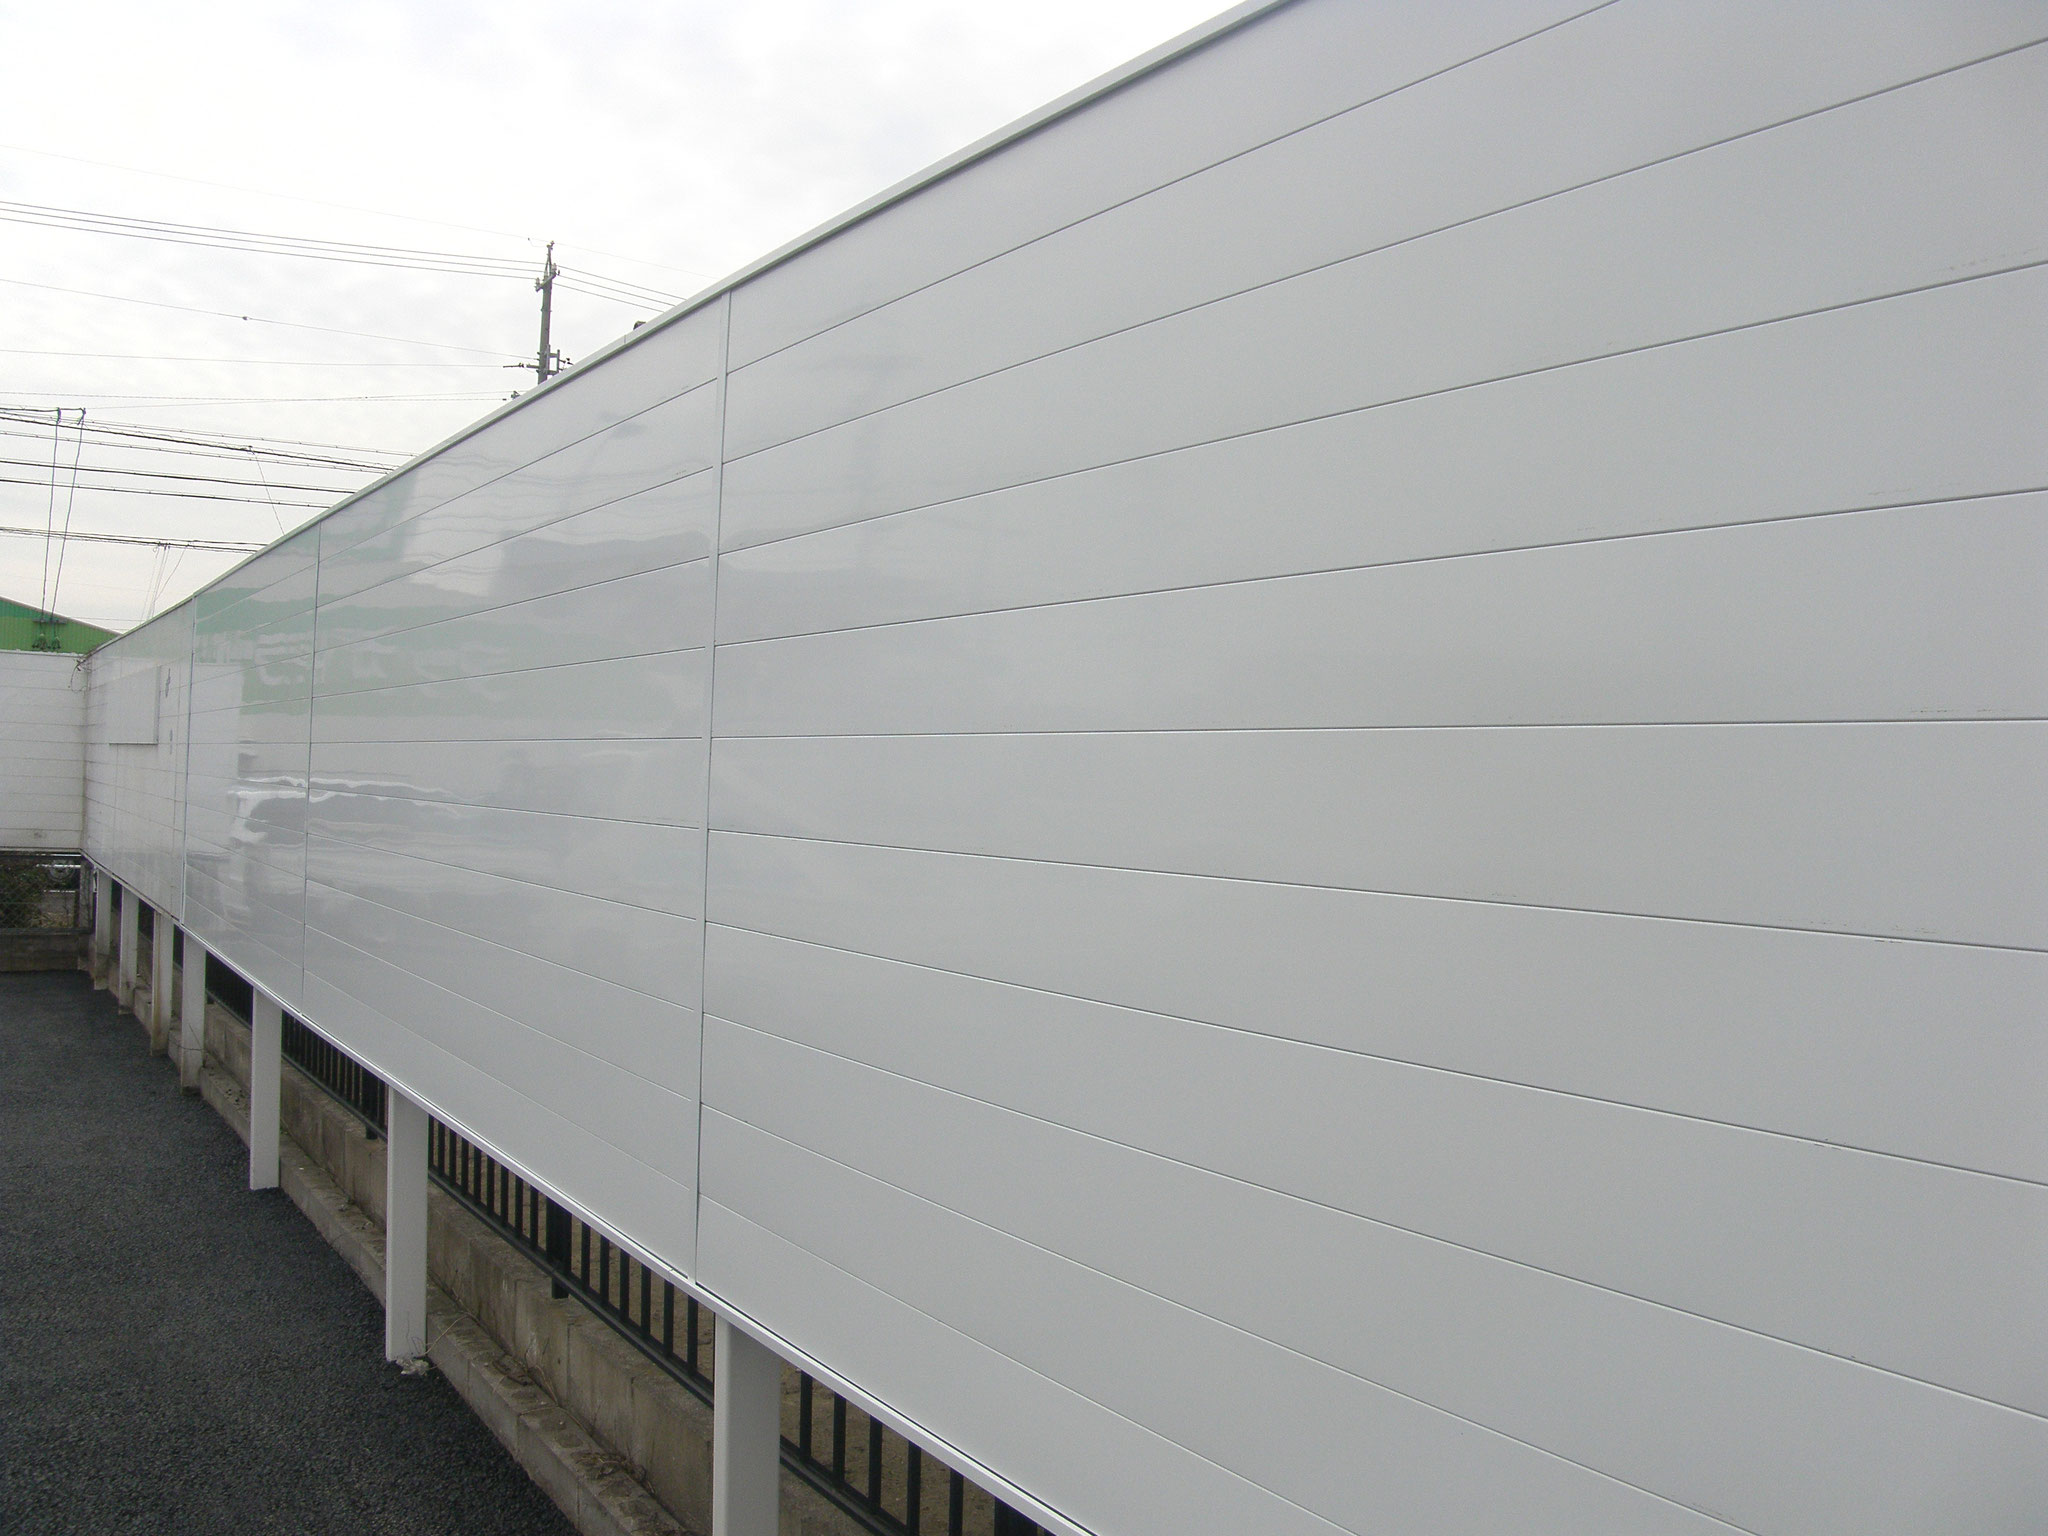 境界フェンス拡張工事:工程写真